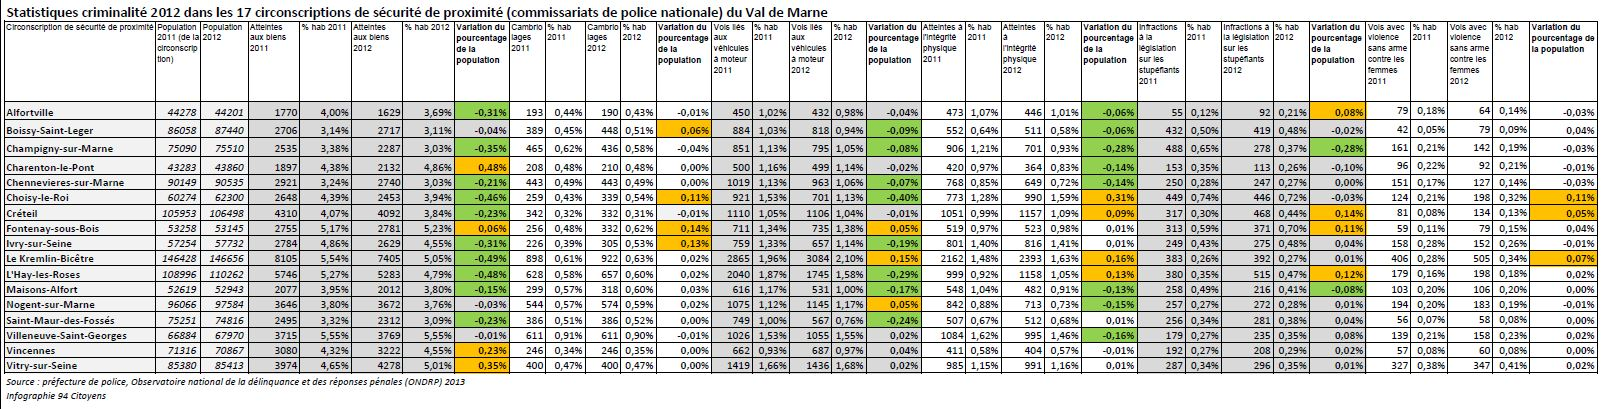 Chiffres Commissariats 2012 Val de Marne